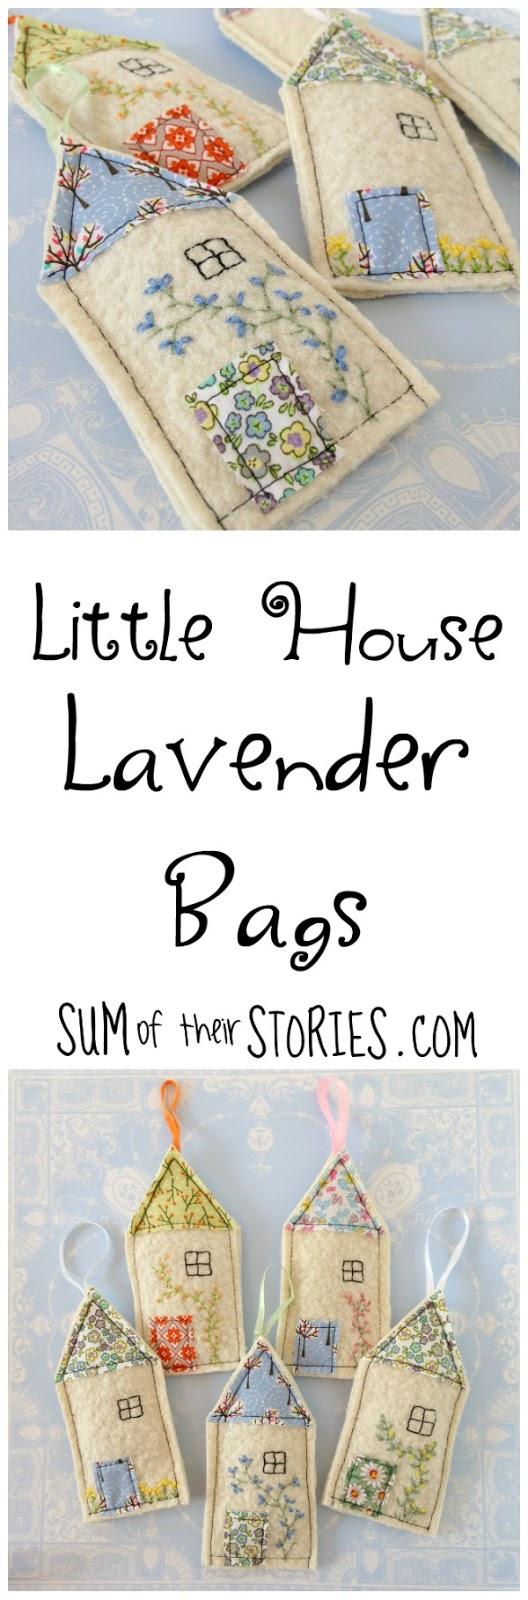 felt house lavender bags